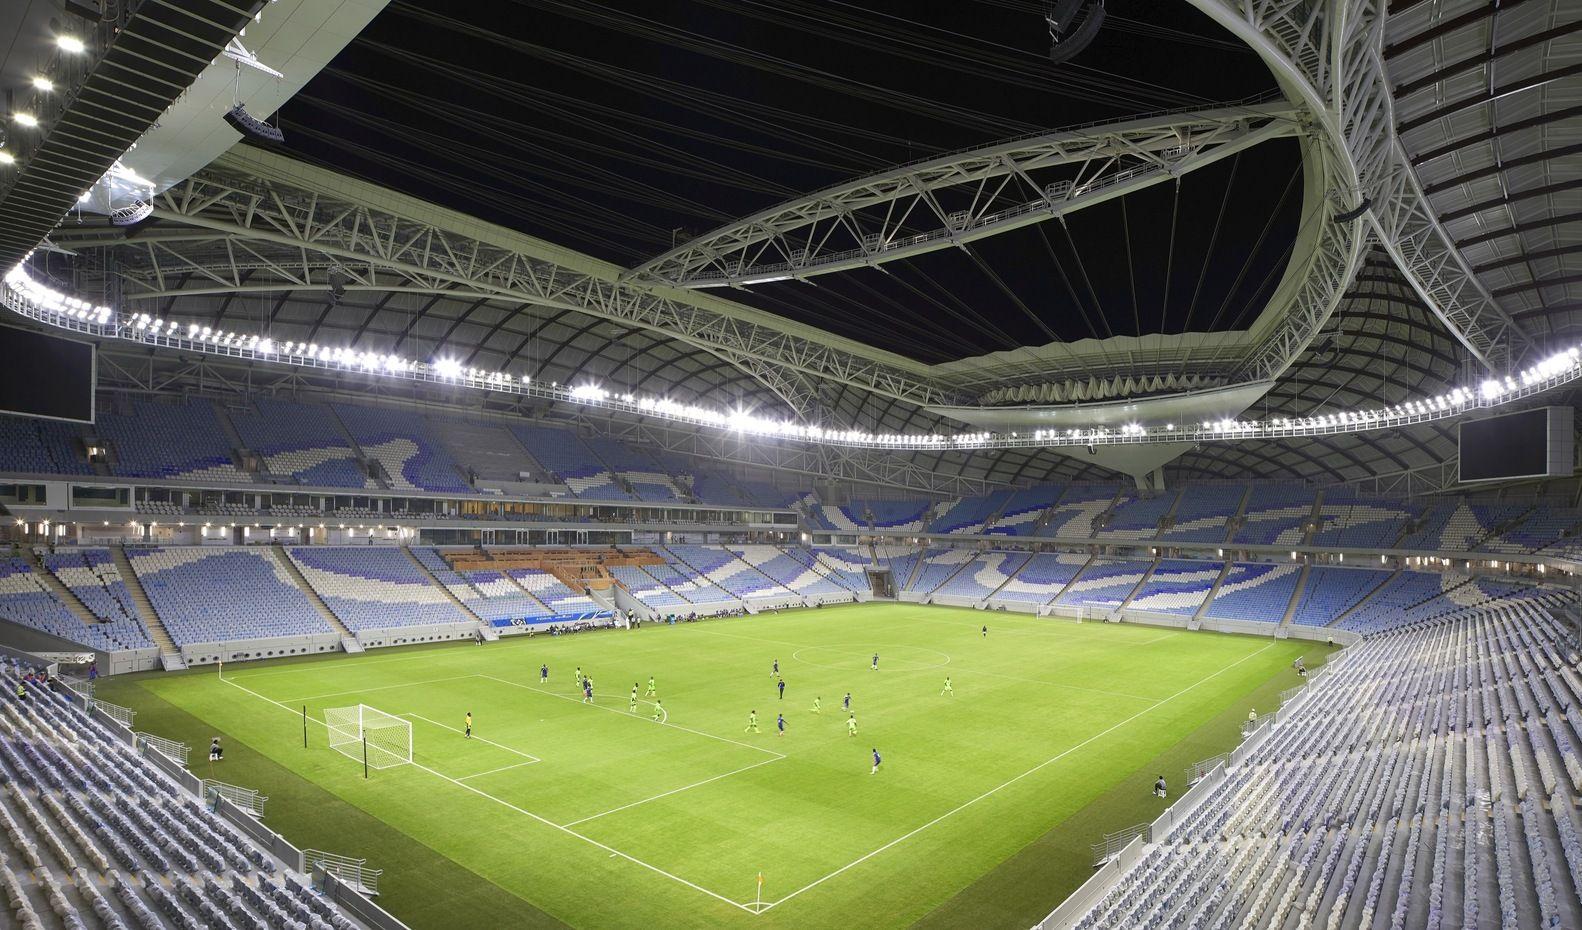 Gallery Of Zaha Hadid Architects First 2022 Qatar World Cup Stadium Completed 9 2022 Fifa World Cup Zaha Hadid Qatar World Cup Stadiums